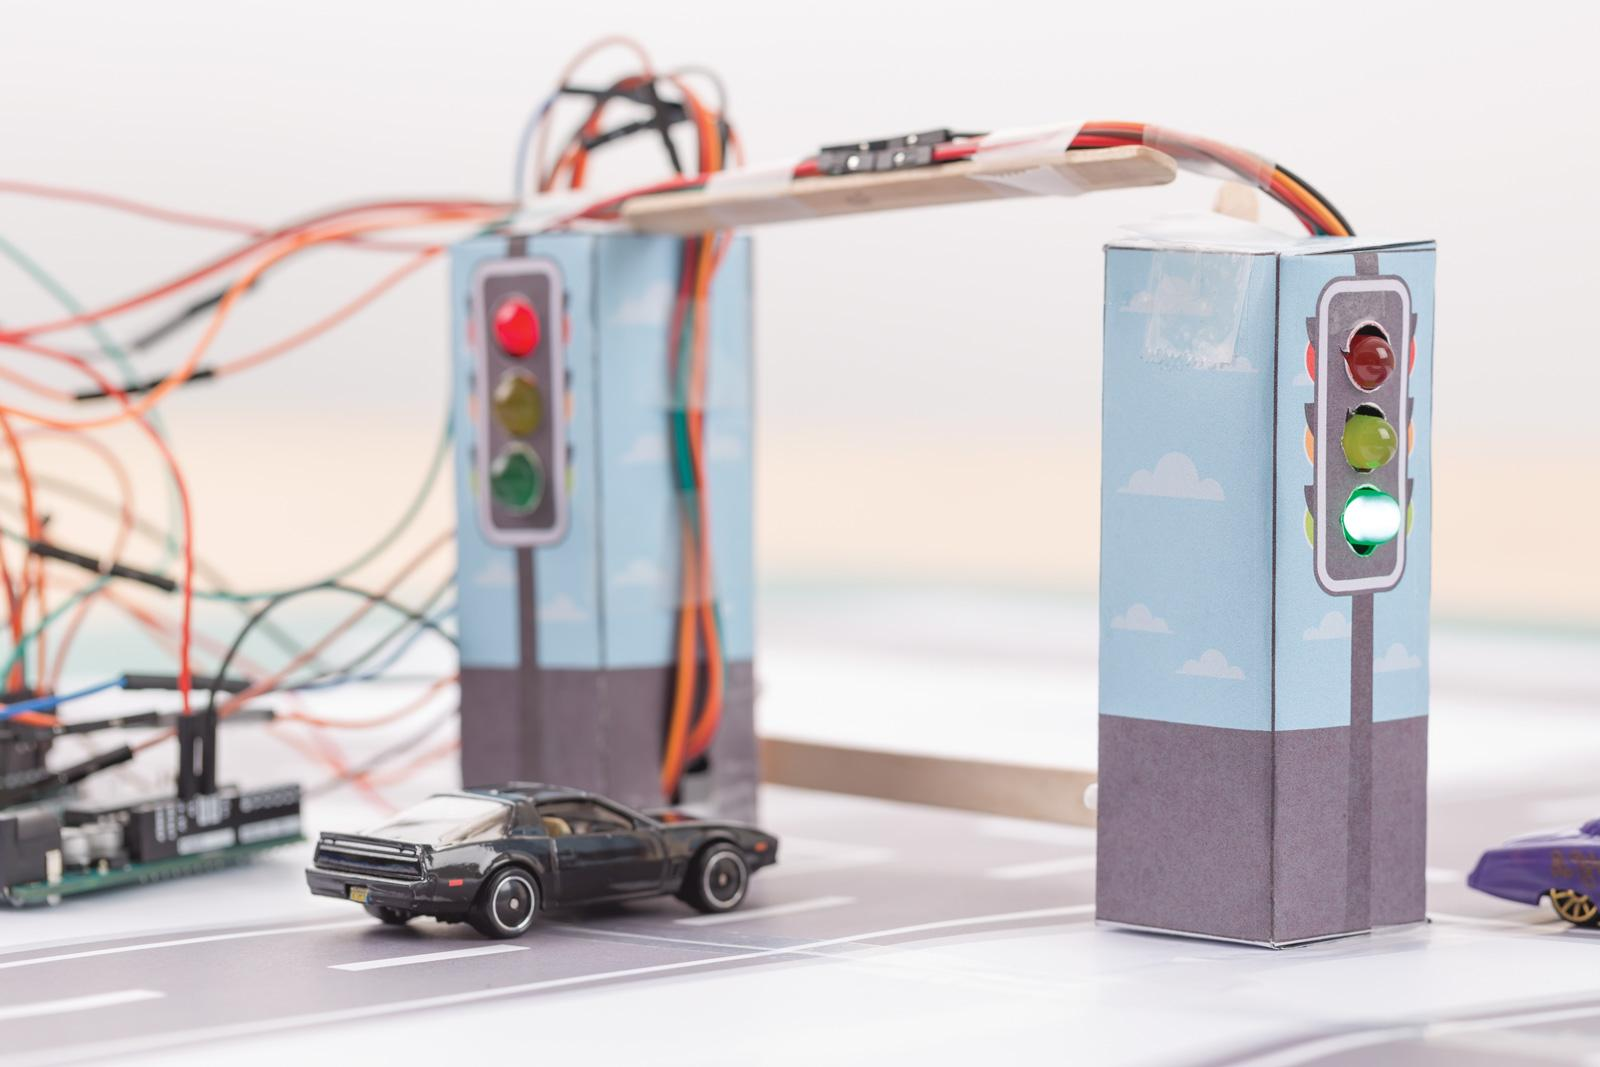 Traffic Signal Circuit Diagram | Traffic Light Wiring Diagram Interactive Toy Traffic Lights Circuit